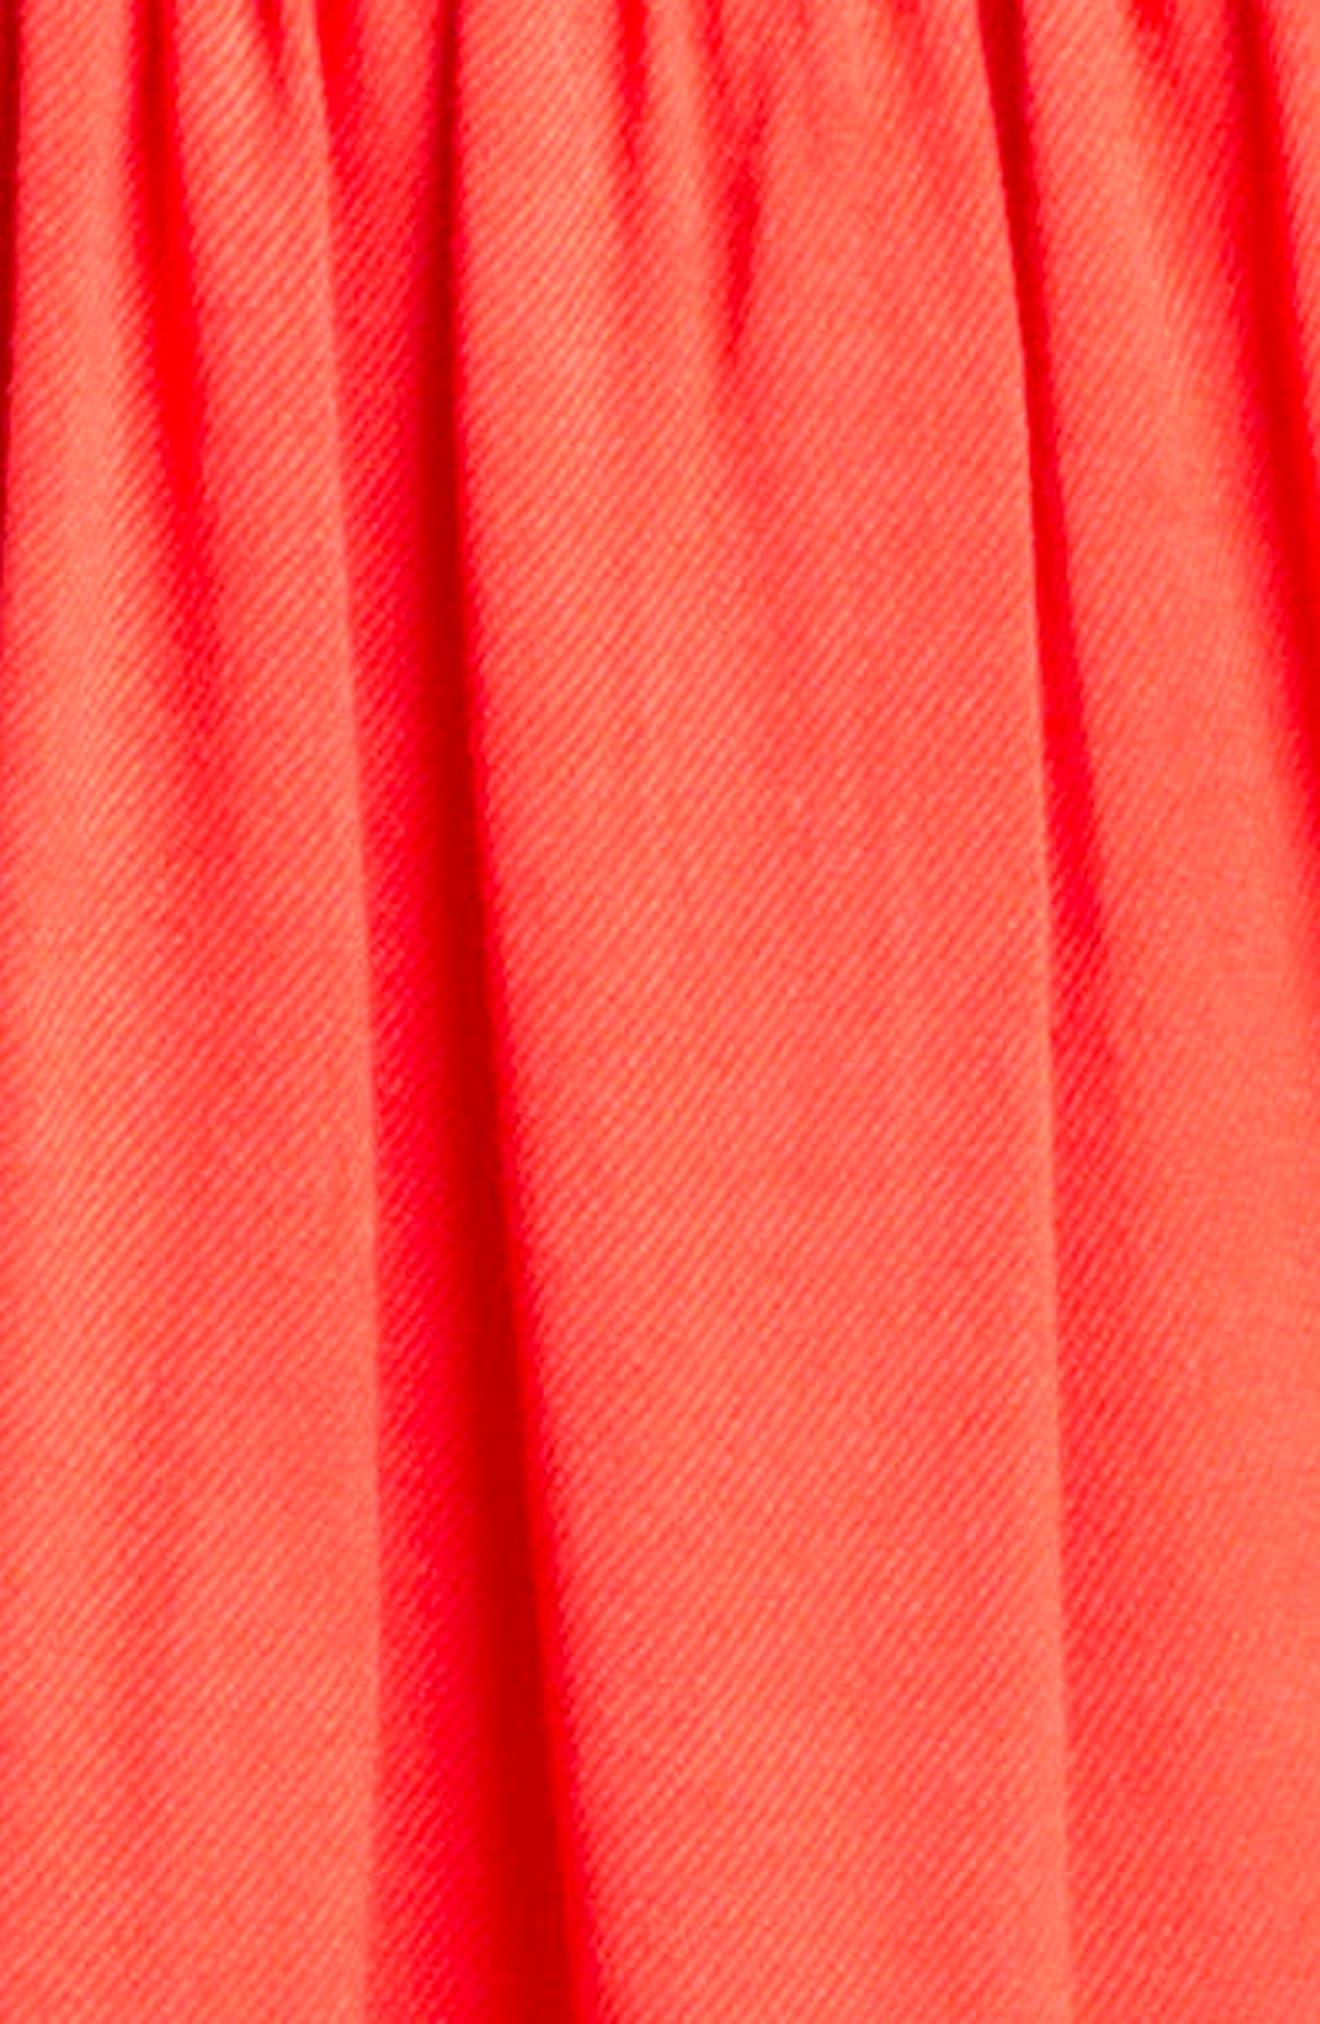 Dahlia Flutter Sleeve Dress,                             Alternate thumbnail 3, color,                             950